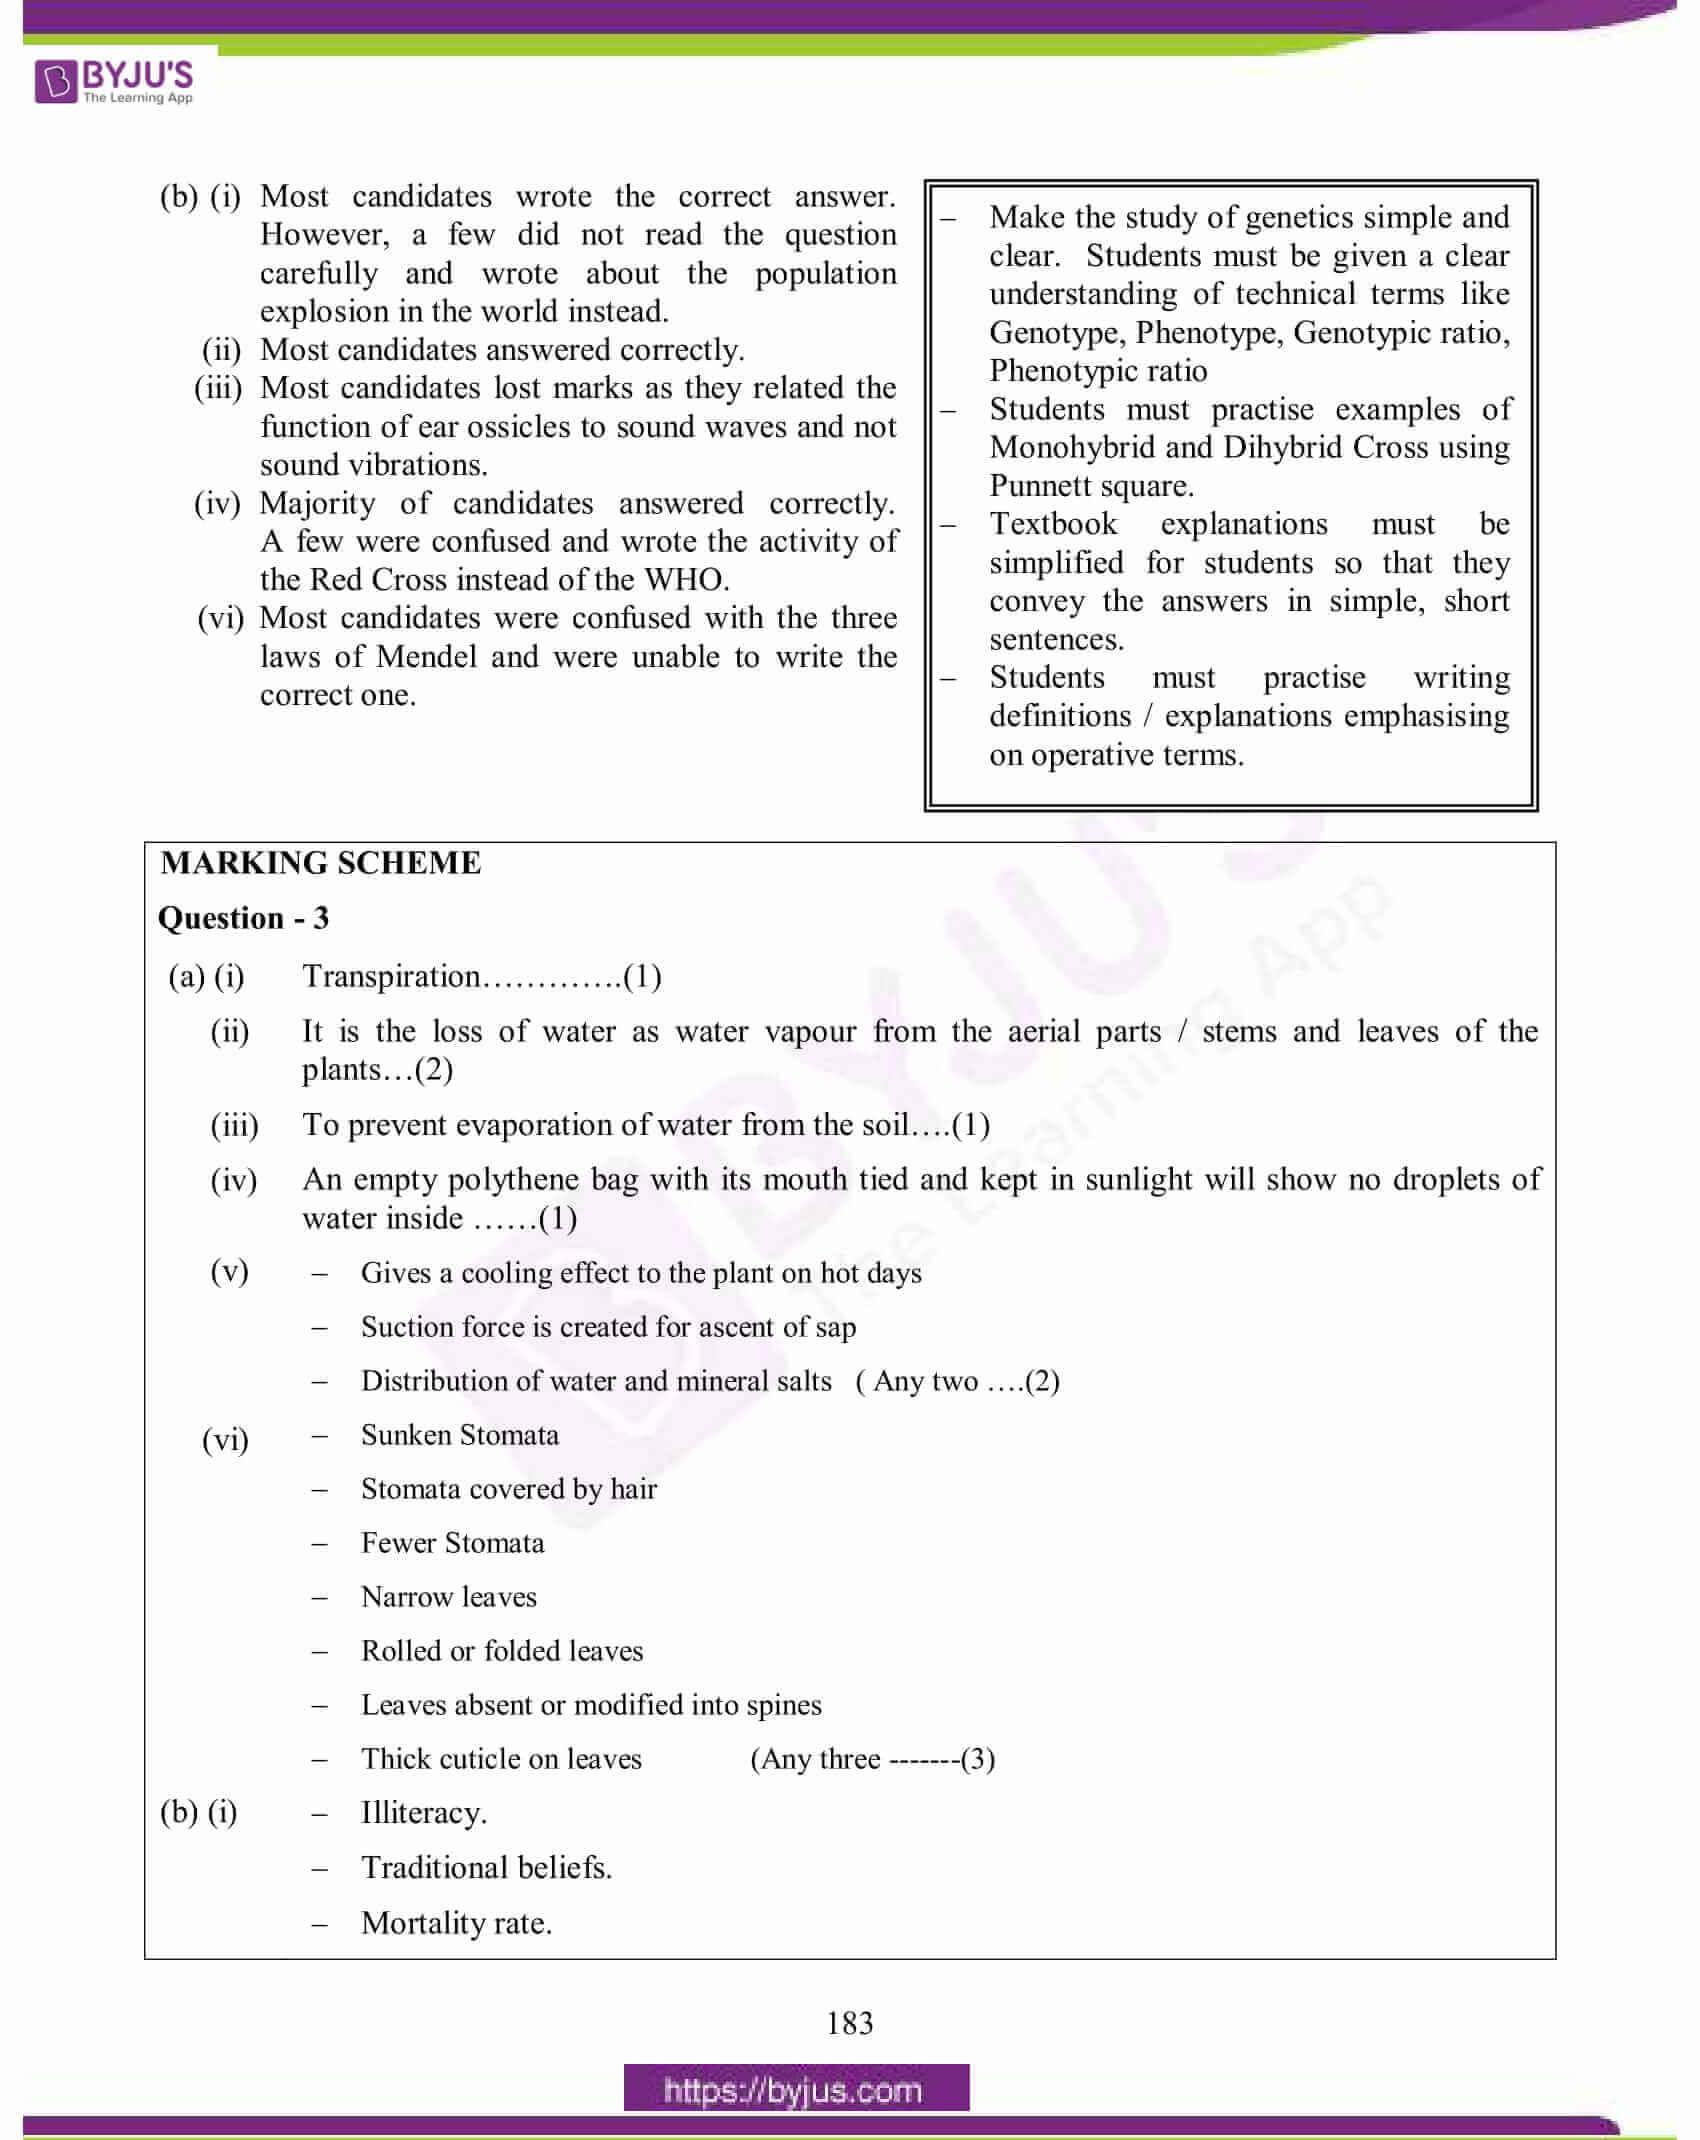 icse class 10 biology question paper solution 2015 10